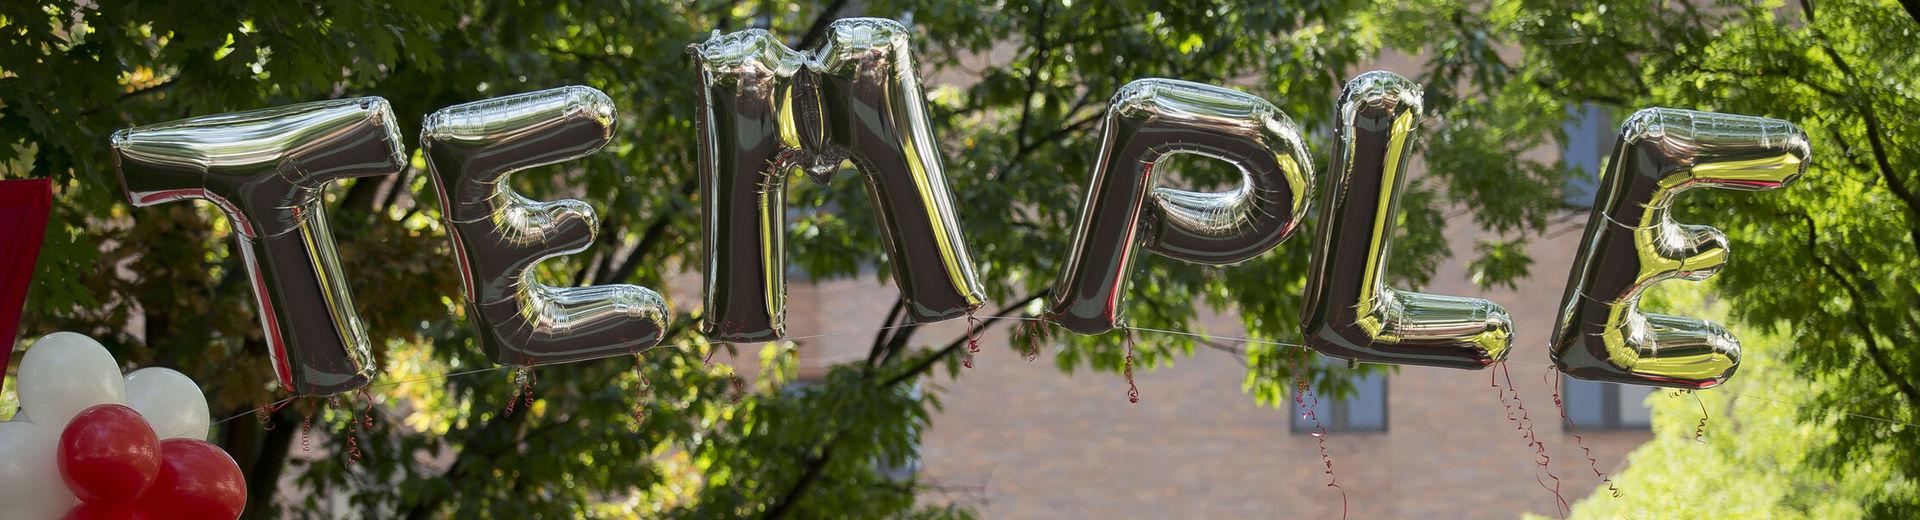 Temple balloons